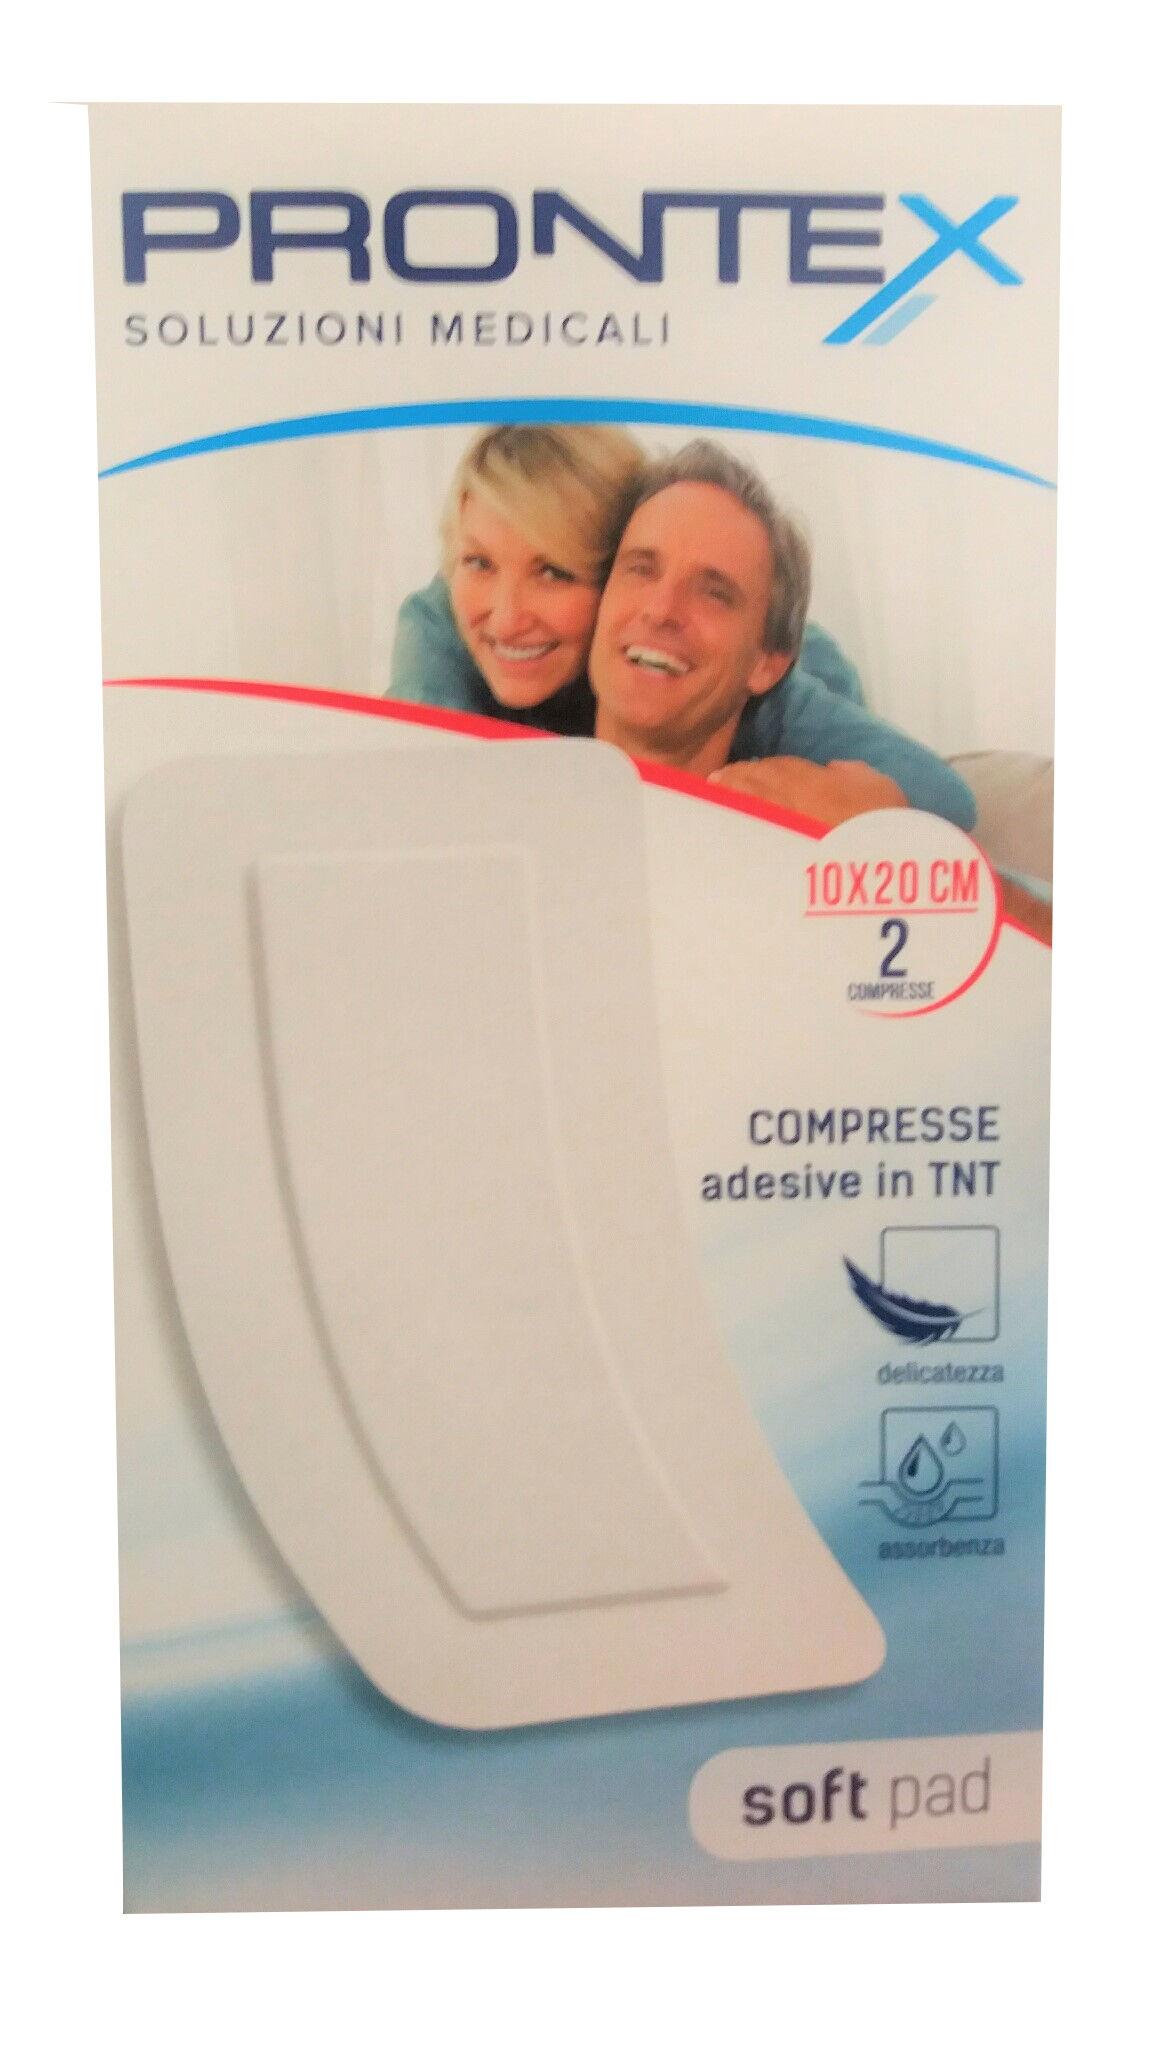 Safety Soft Pad Compresse Adesive Sterili formato 10X20cm (2 compresse)